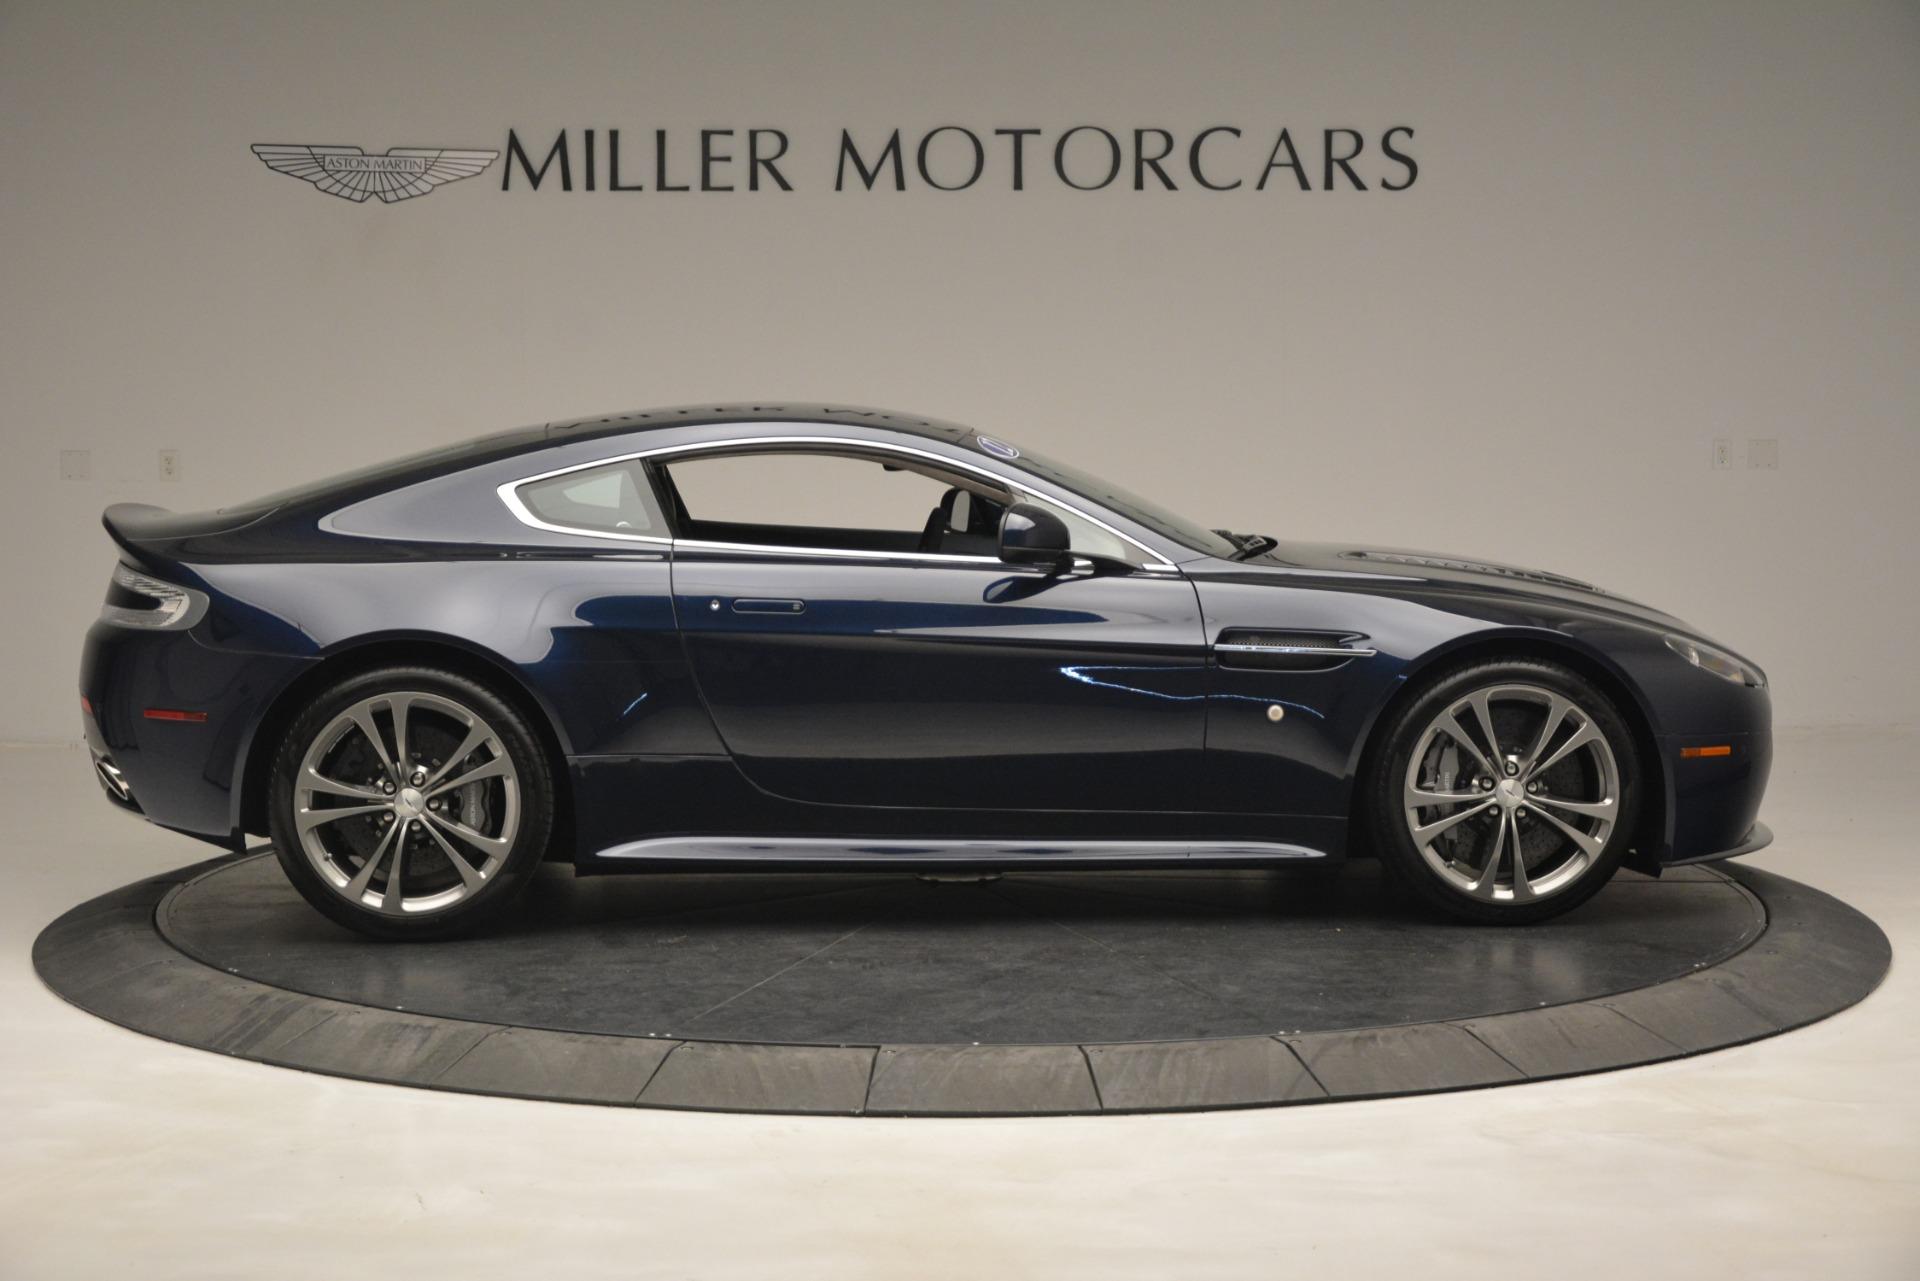 Used 2012 Aston Martin V12 Vantage  For Sale In Greenwich, CT 3046_p9